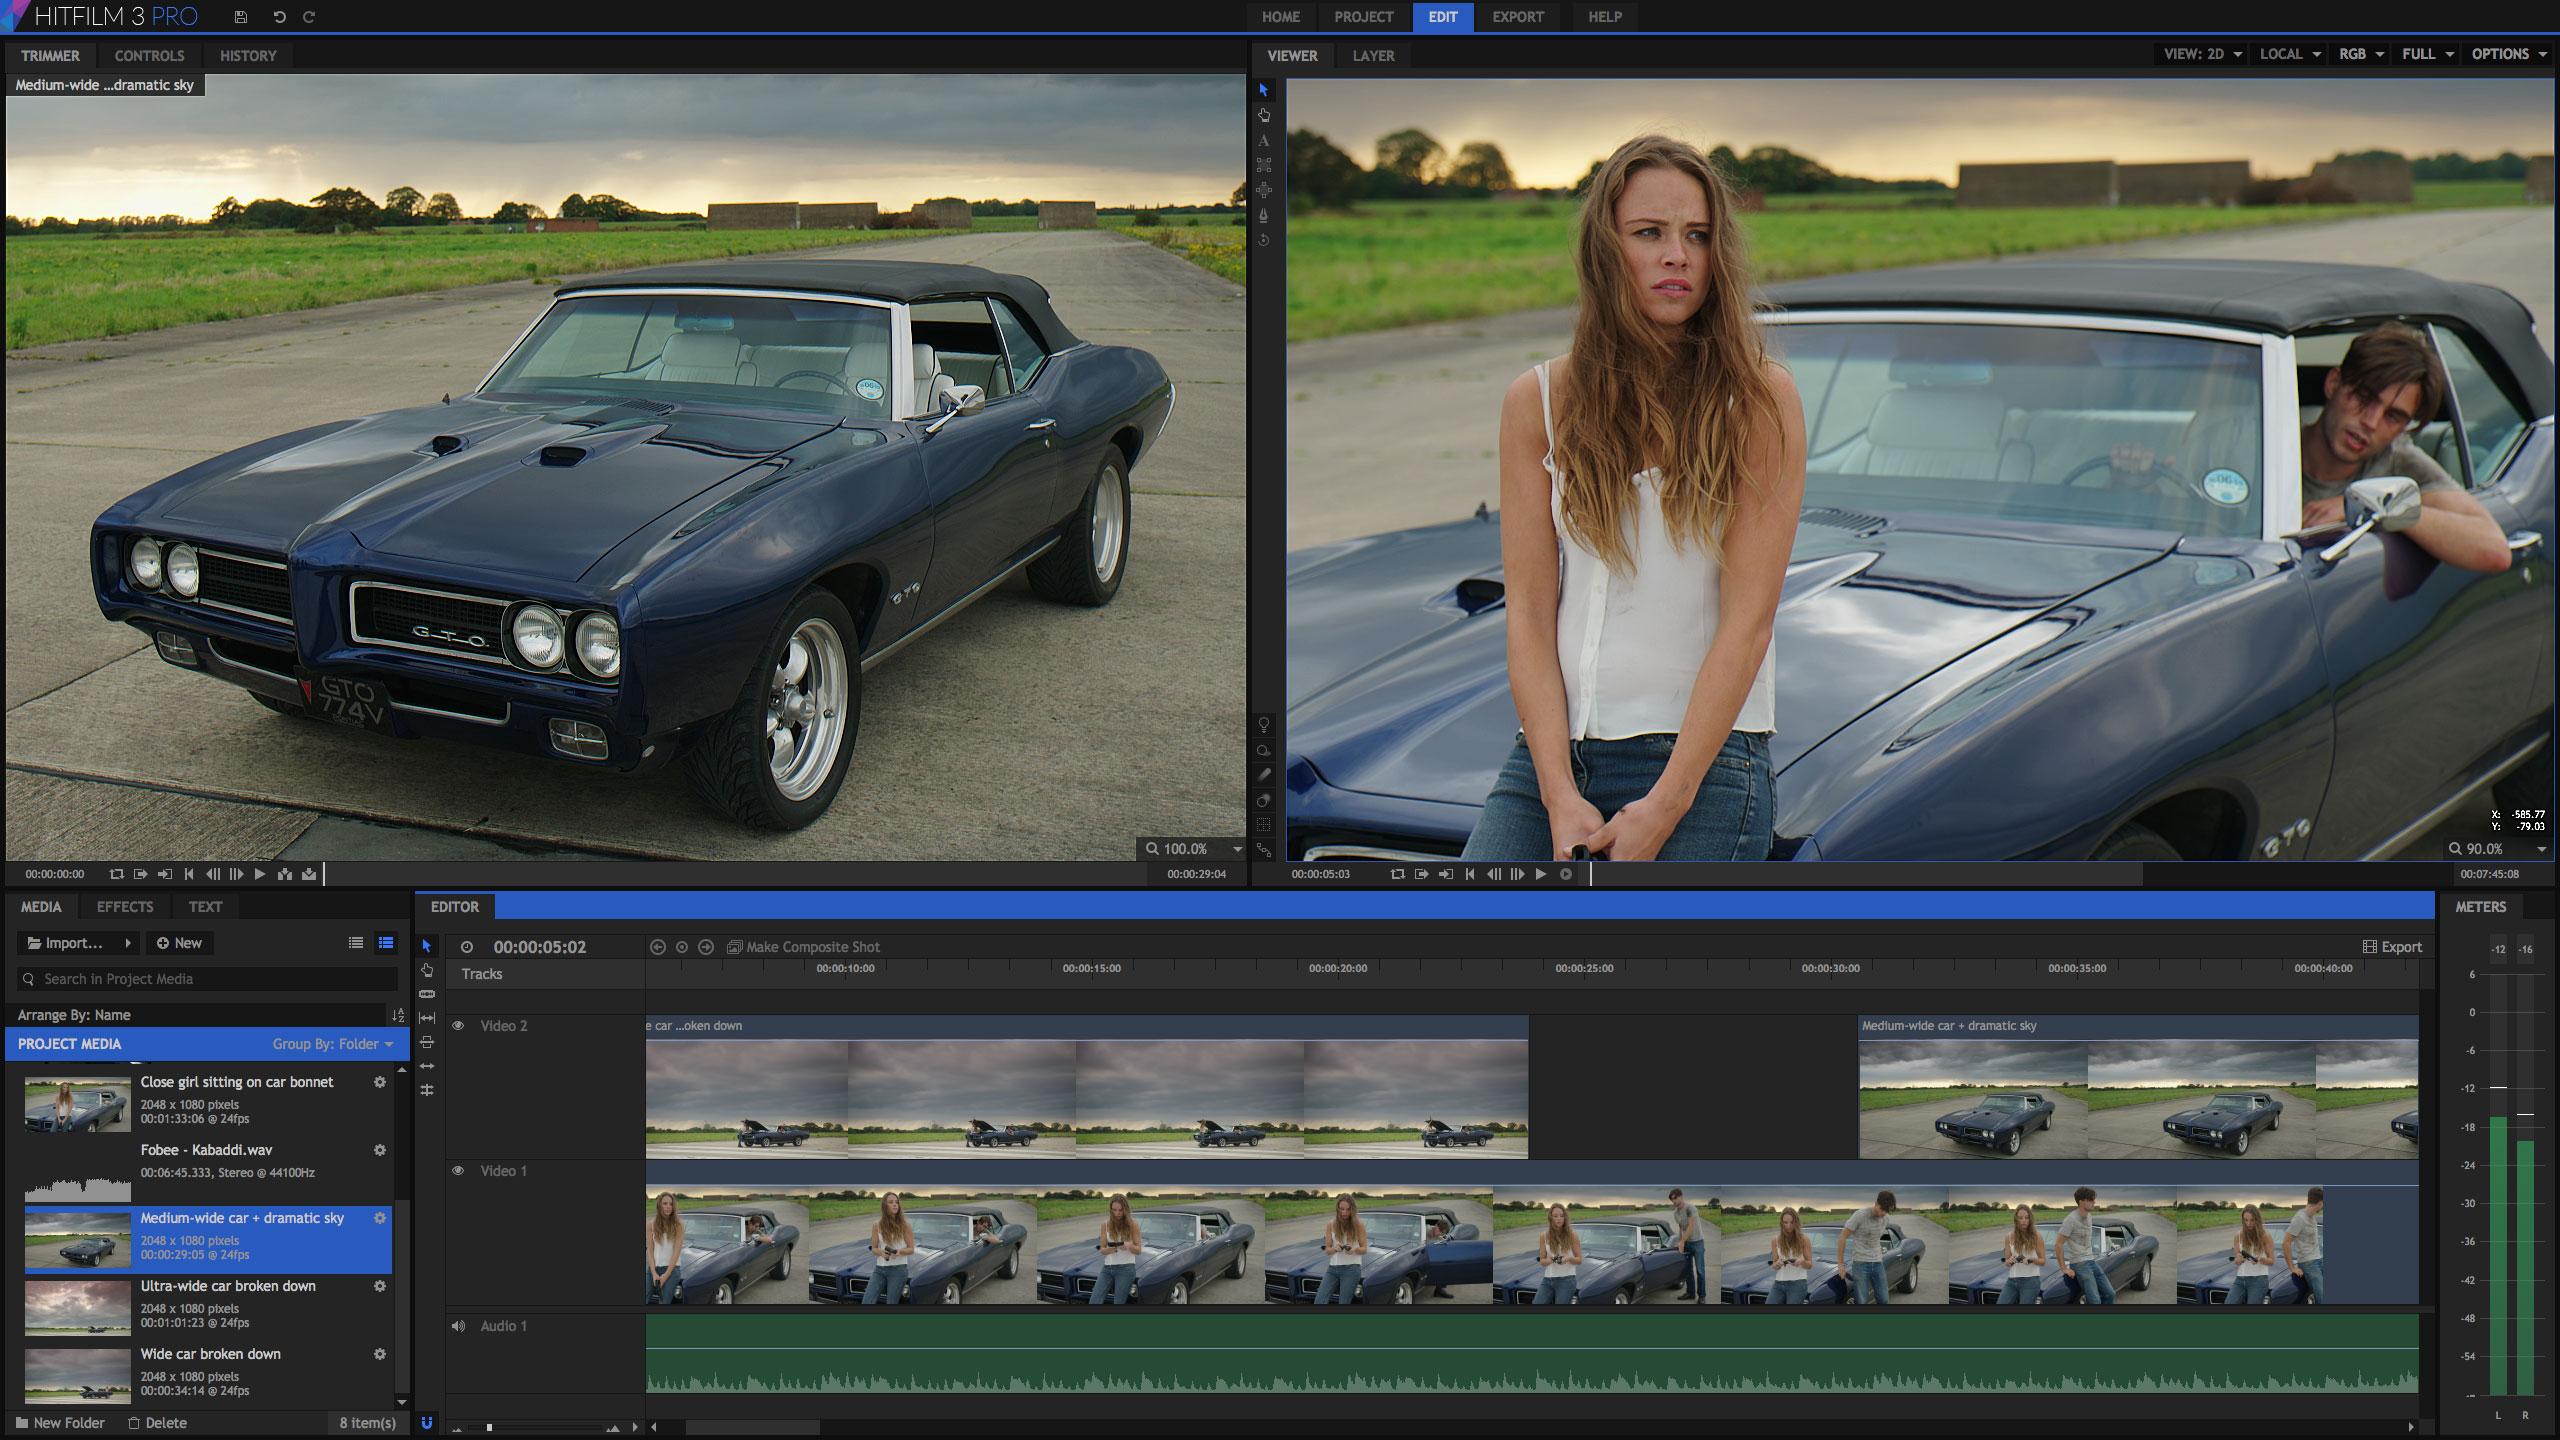 HitFilm Pro 3